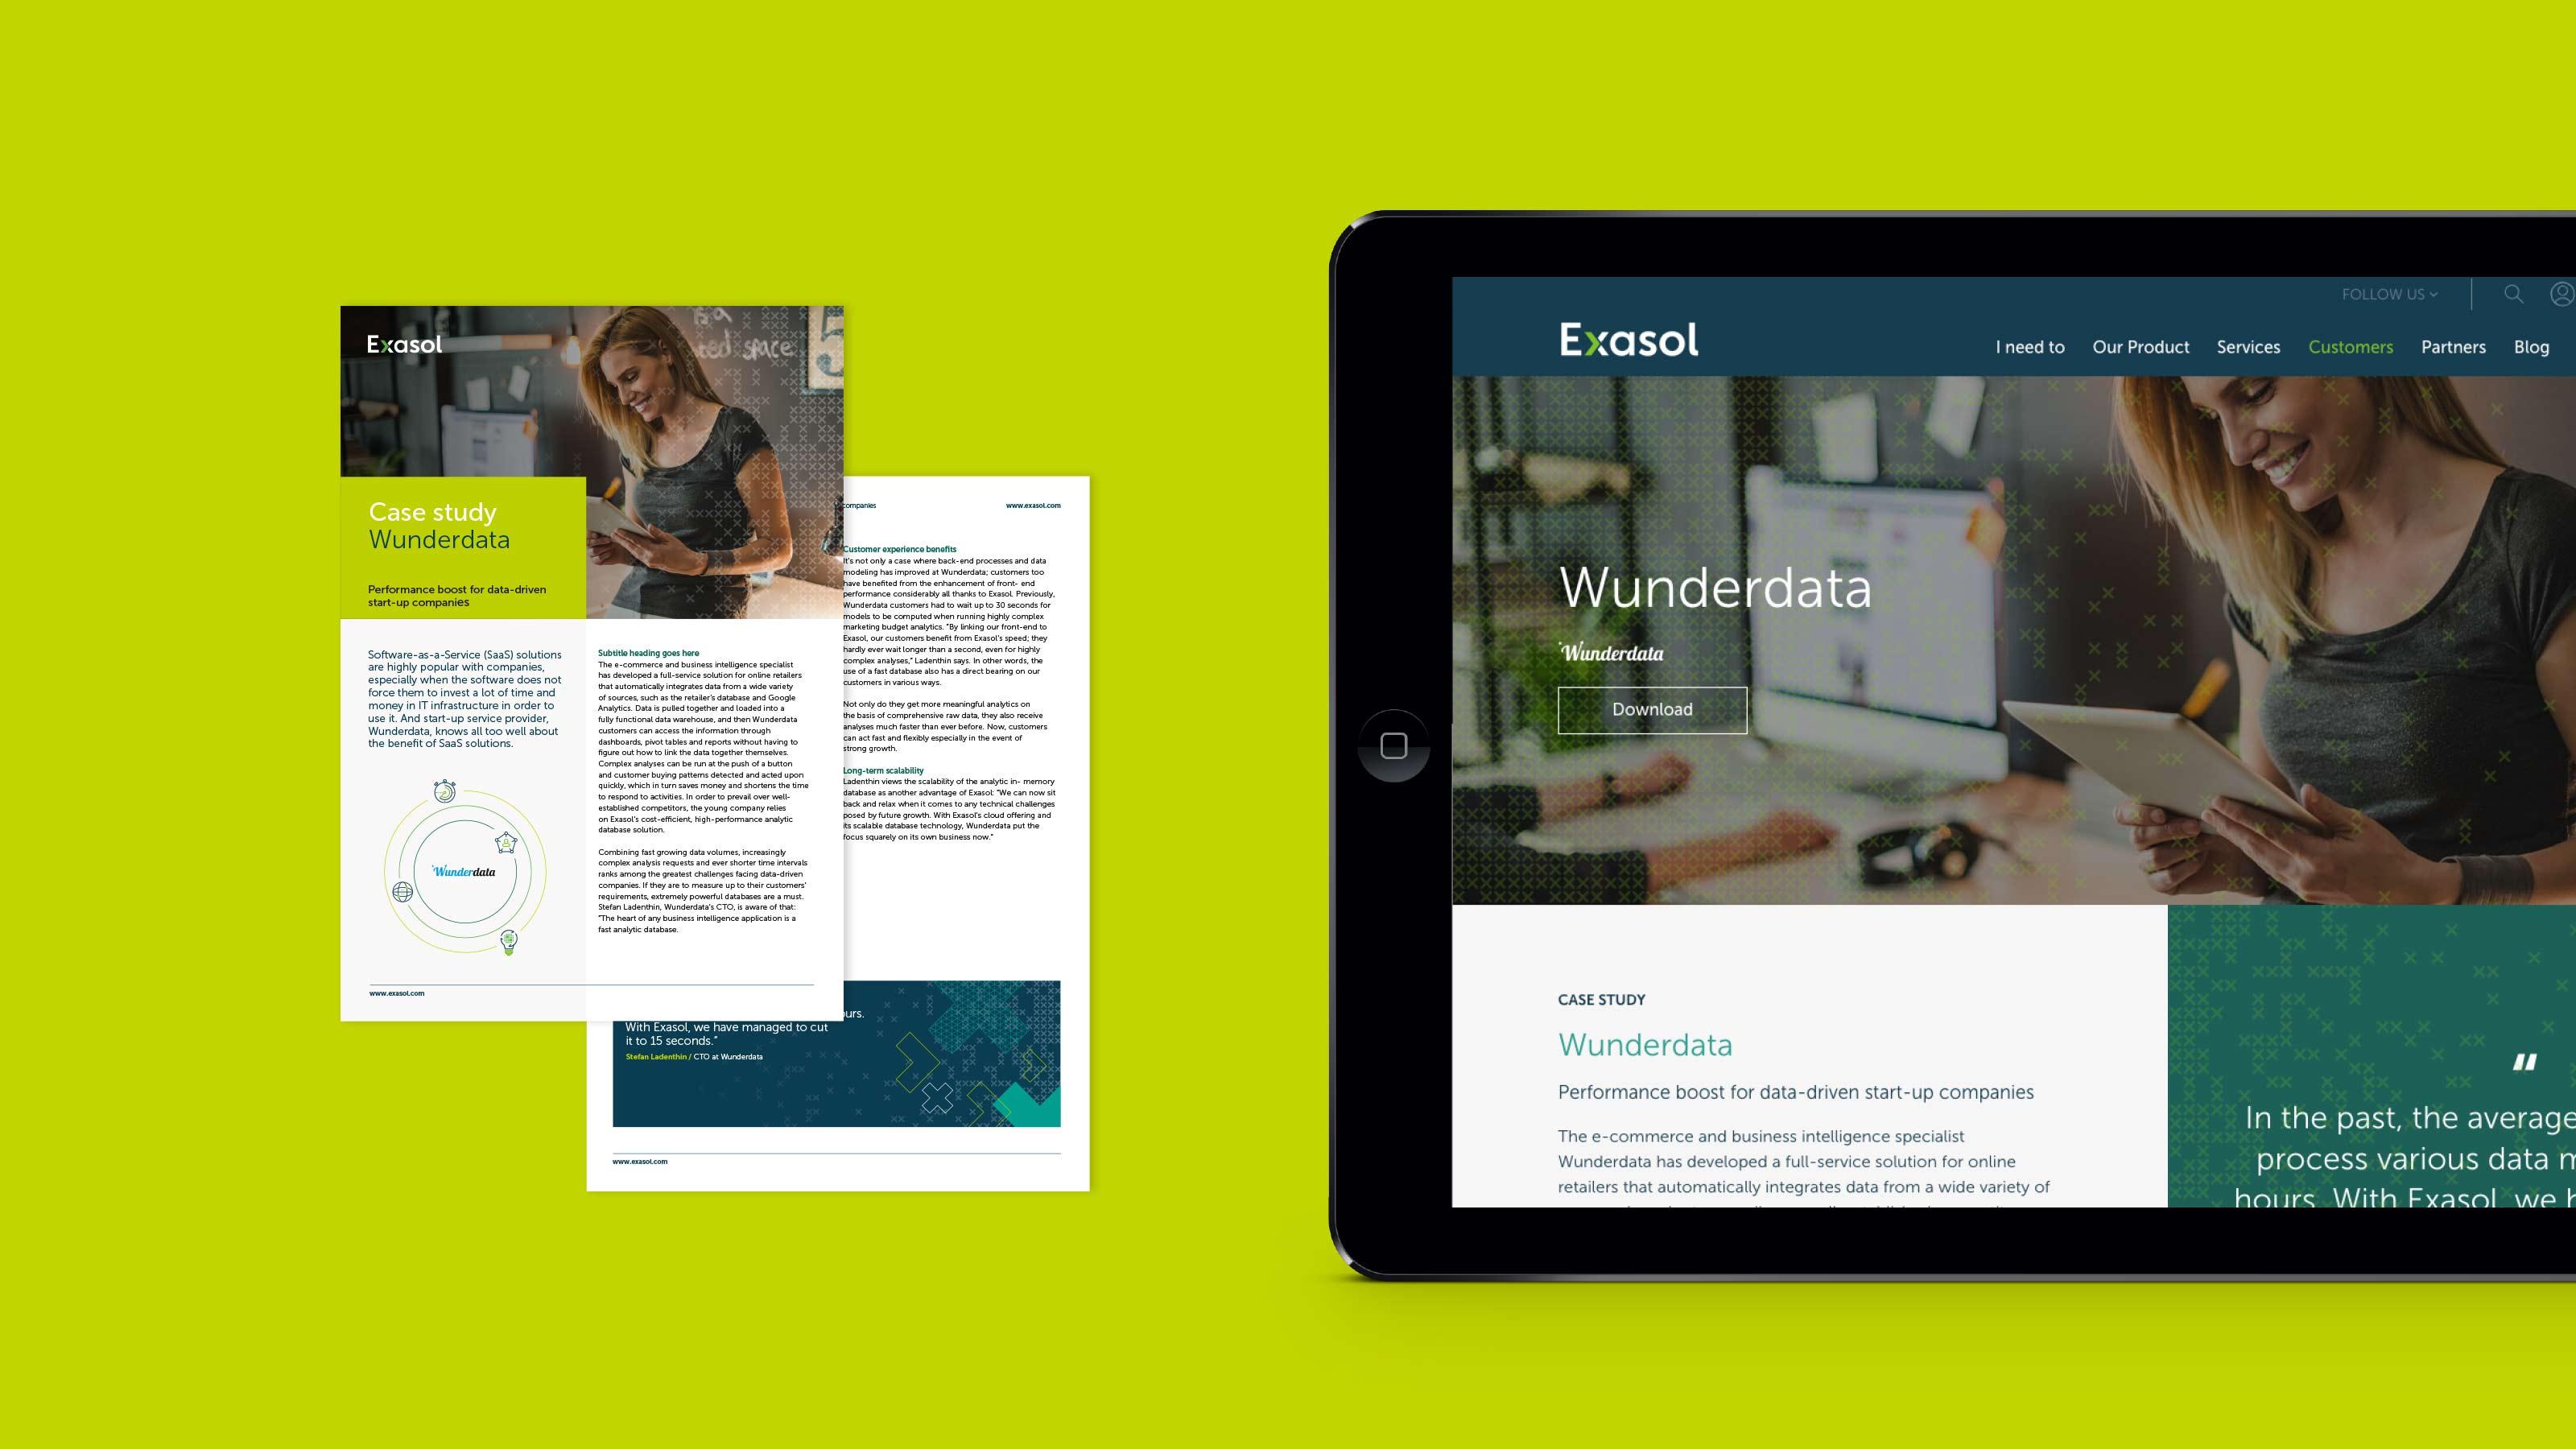 brand-website-green-background-Exasol